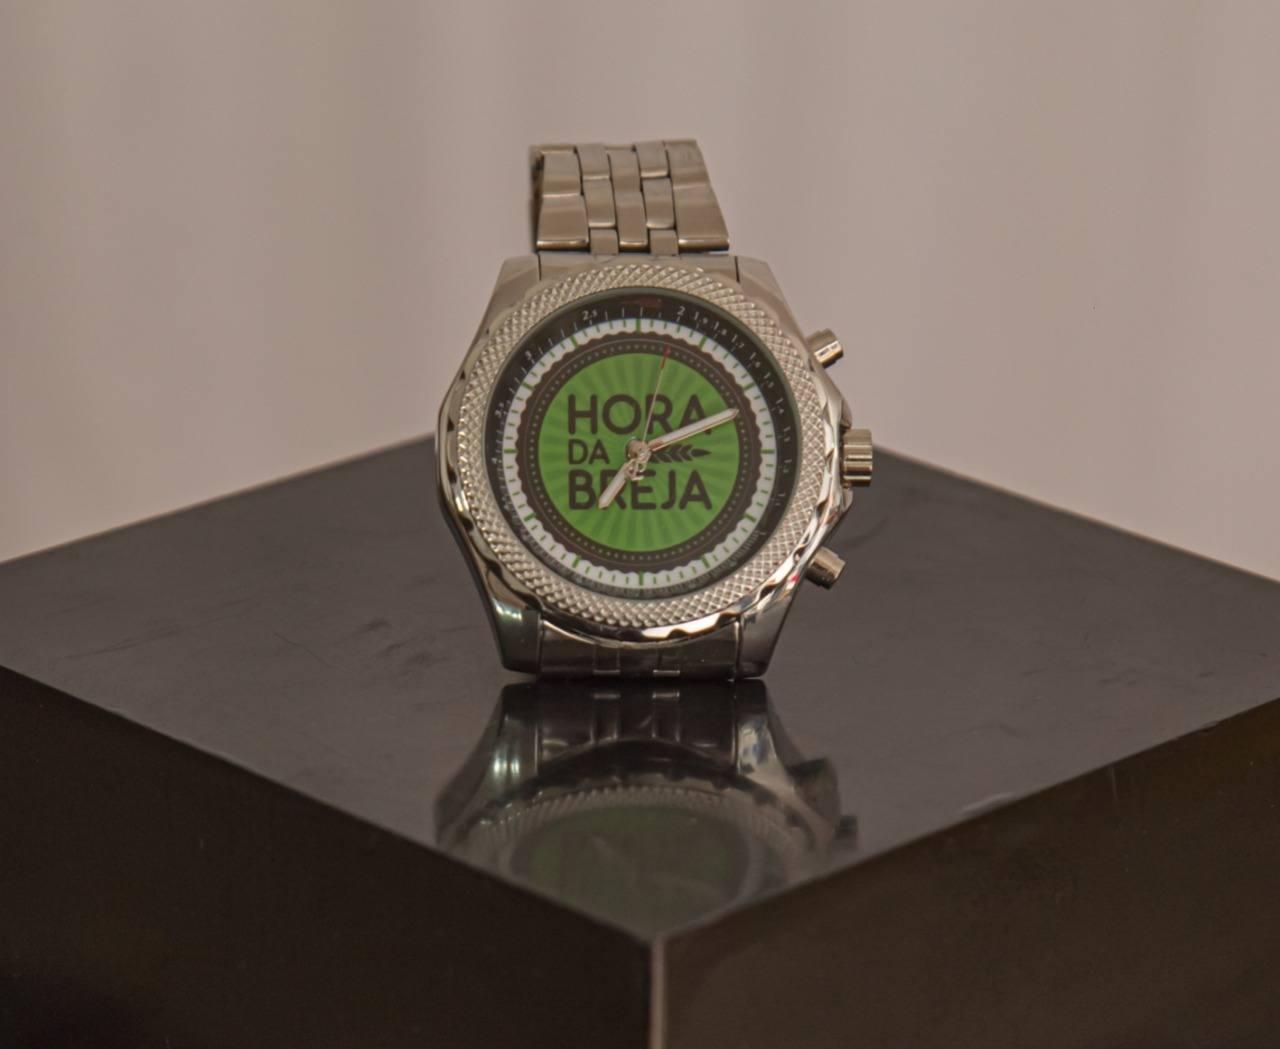 Relógio Saimom Modelo Hora da Breja - Masculino